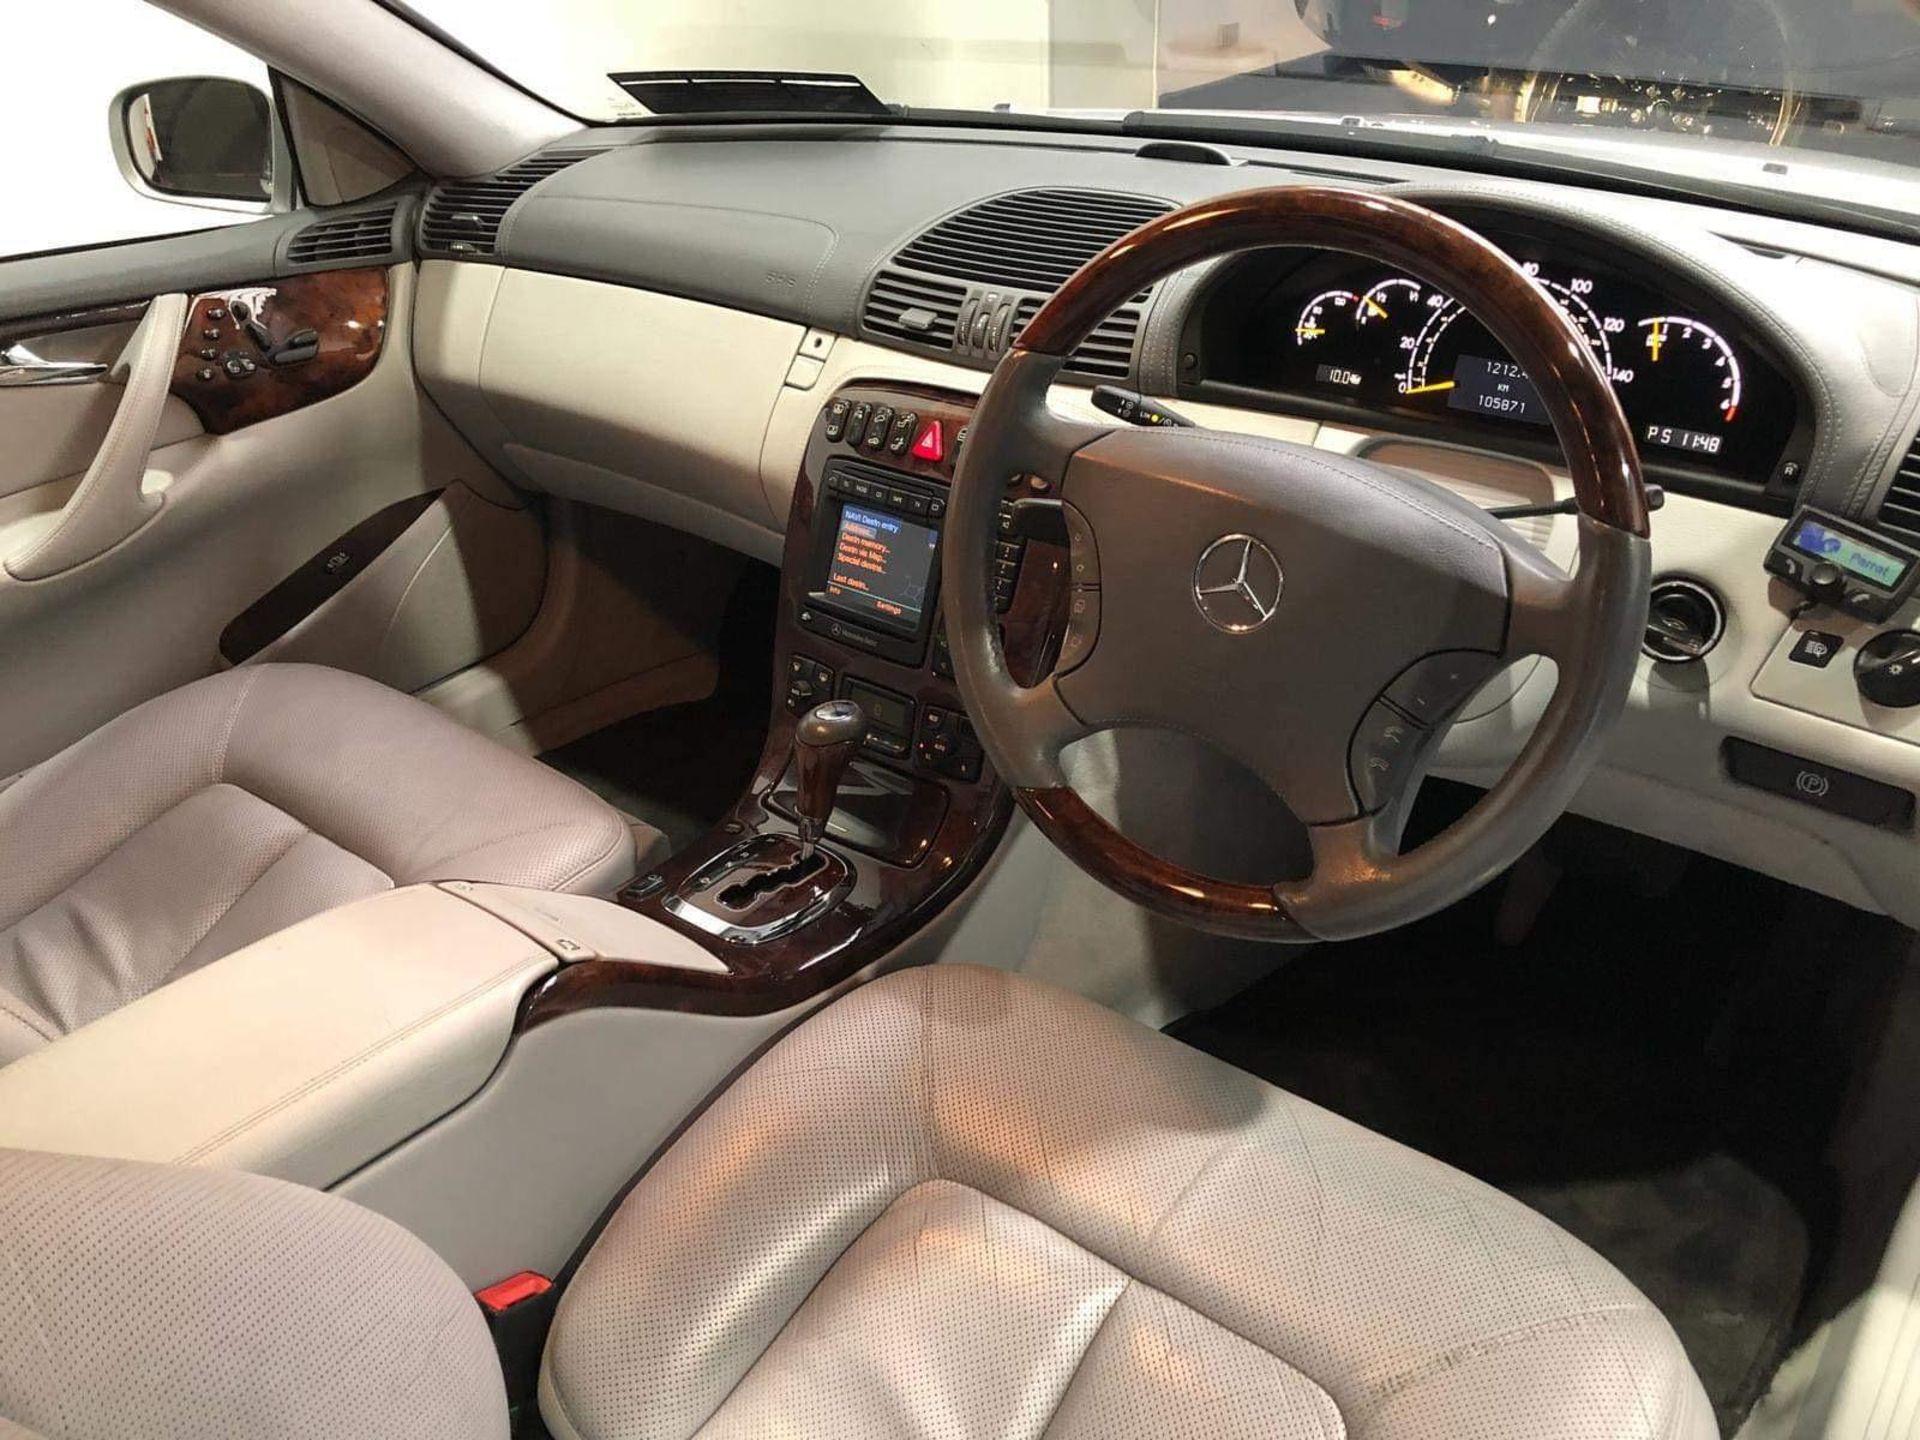 2001 Mercedes-Benz CL500 CLASS, SPORT, SOUTHERN REG, TOP SPEC, NO VAT - Image 10 of 10